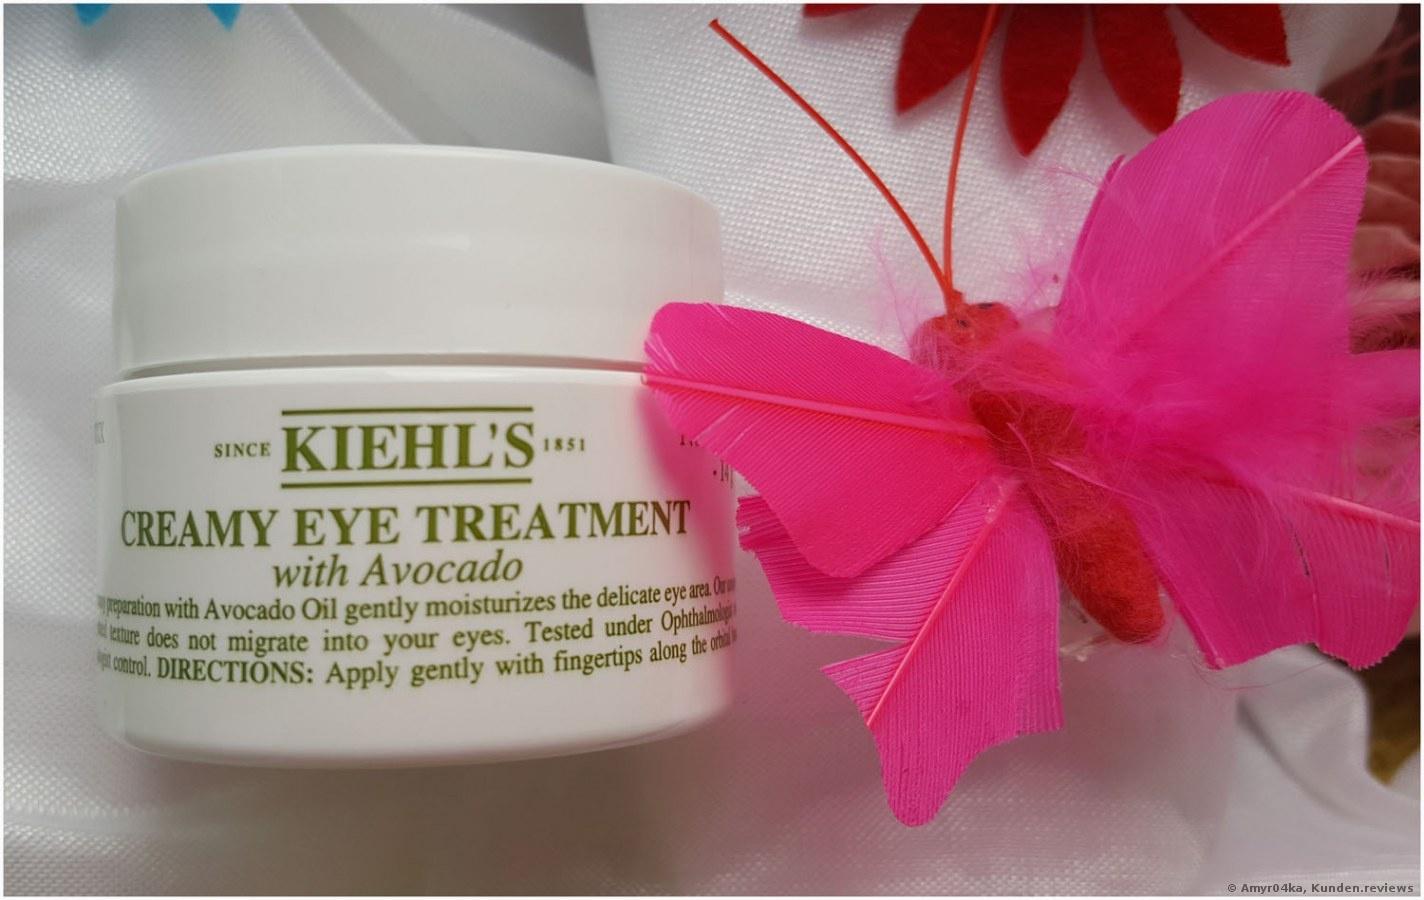 Kiehl's Creamy Eye Treatment with Avocado Augencreme